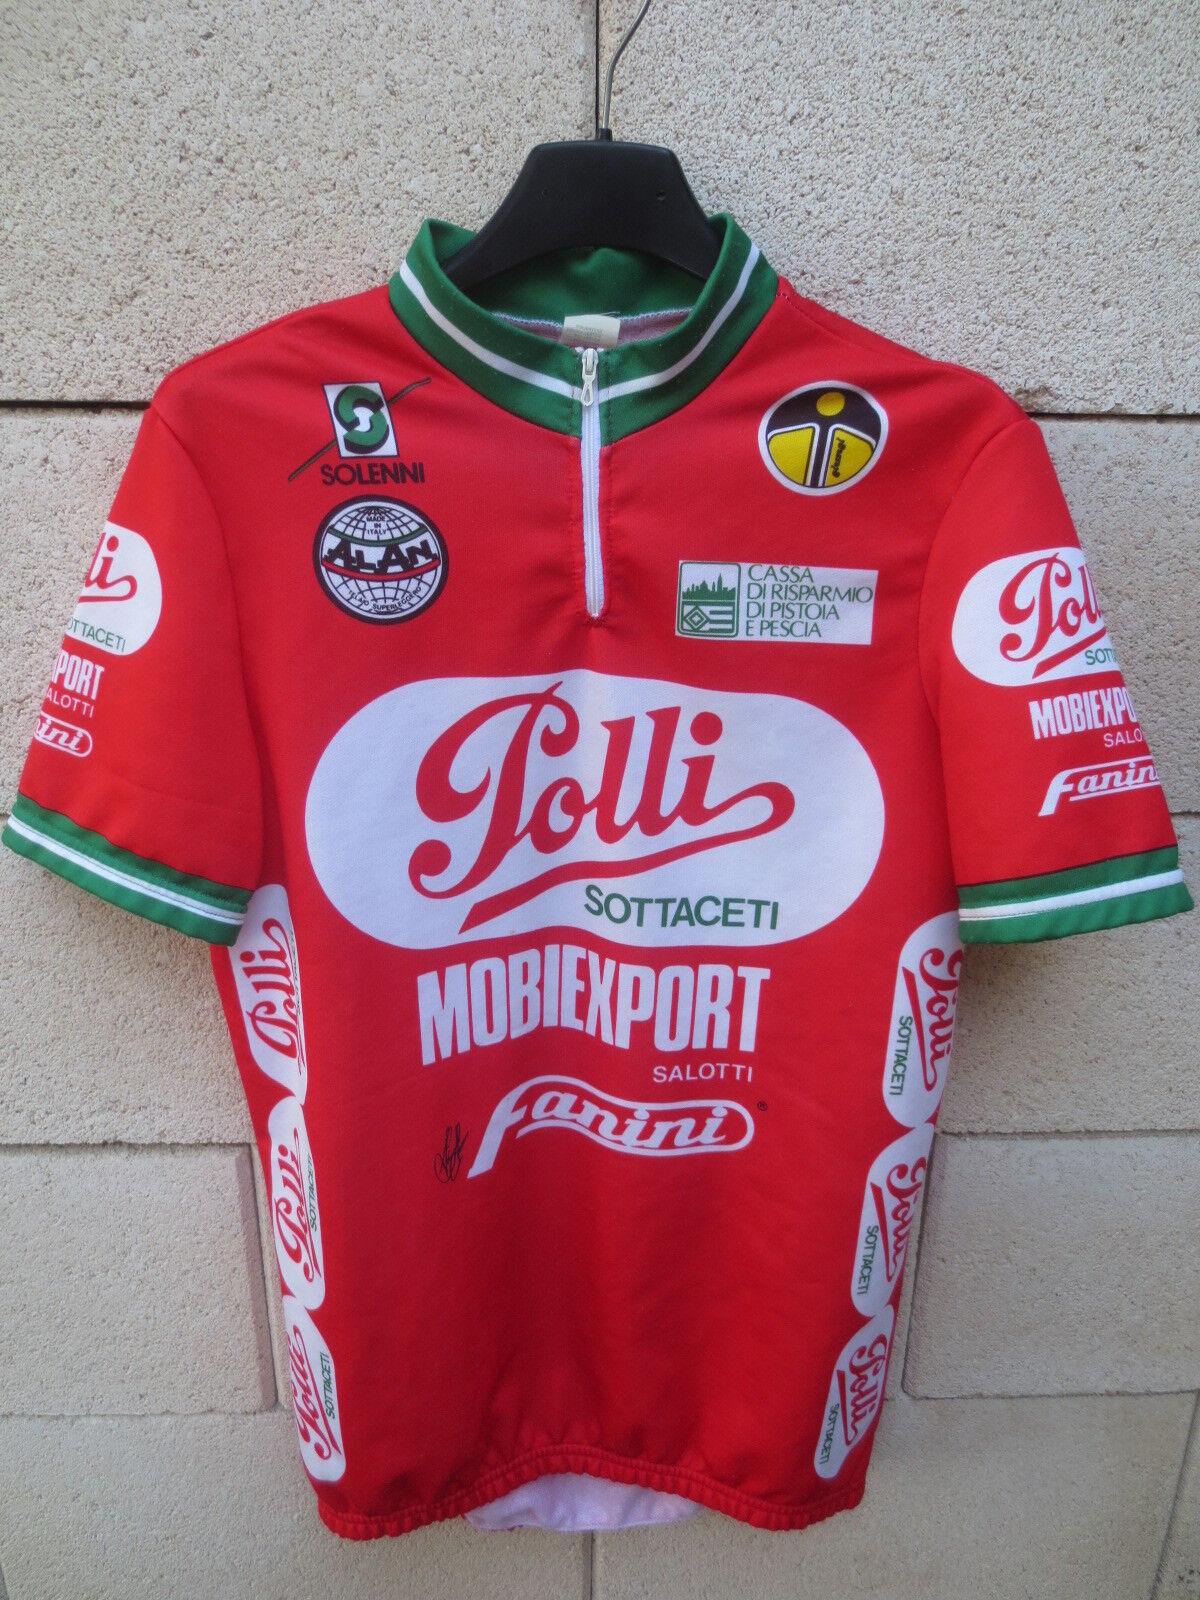 Maillot cycliste POLLI MOBIEXPORT 1989 vintage camiseta  shirt cycling trikot 4